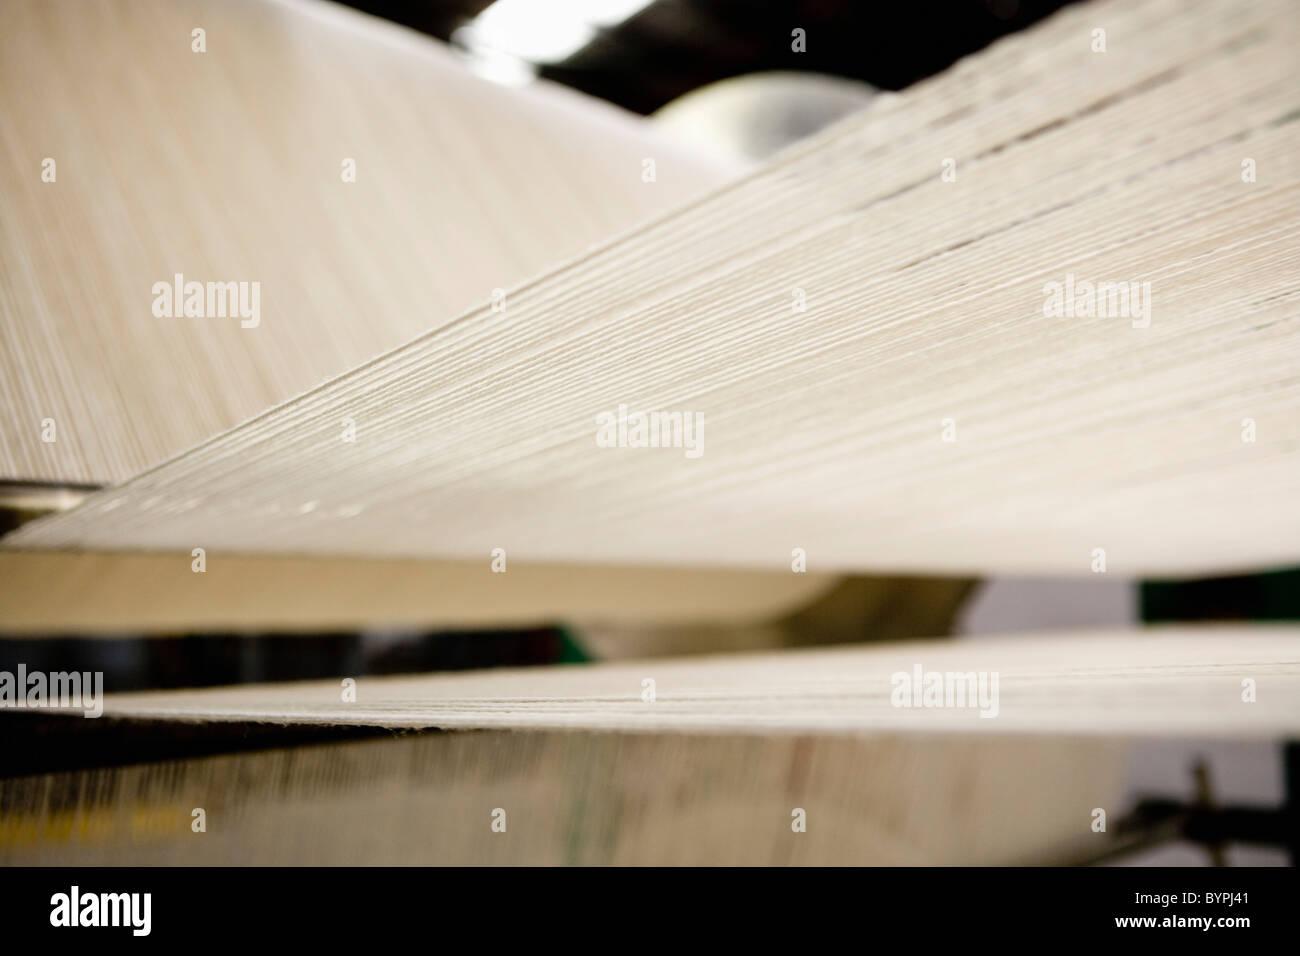 Carpet weaving loom in carpet tile factory - Stock Image